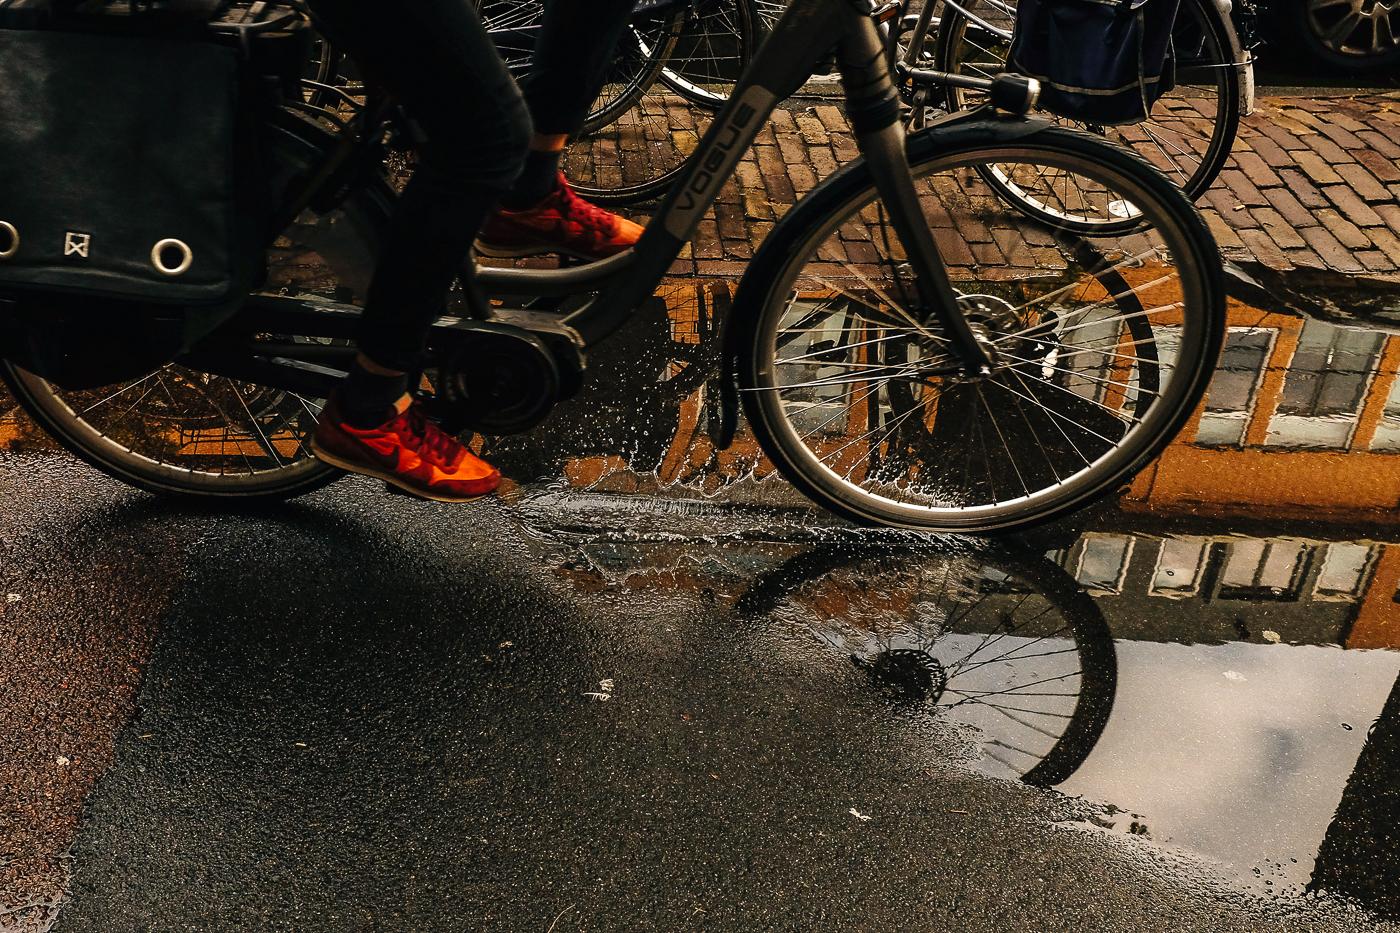 hb images - Amsterdam bike - 3